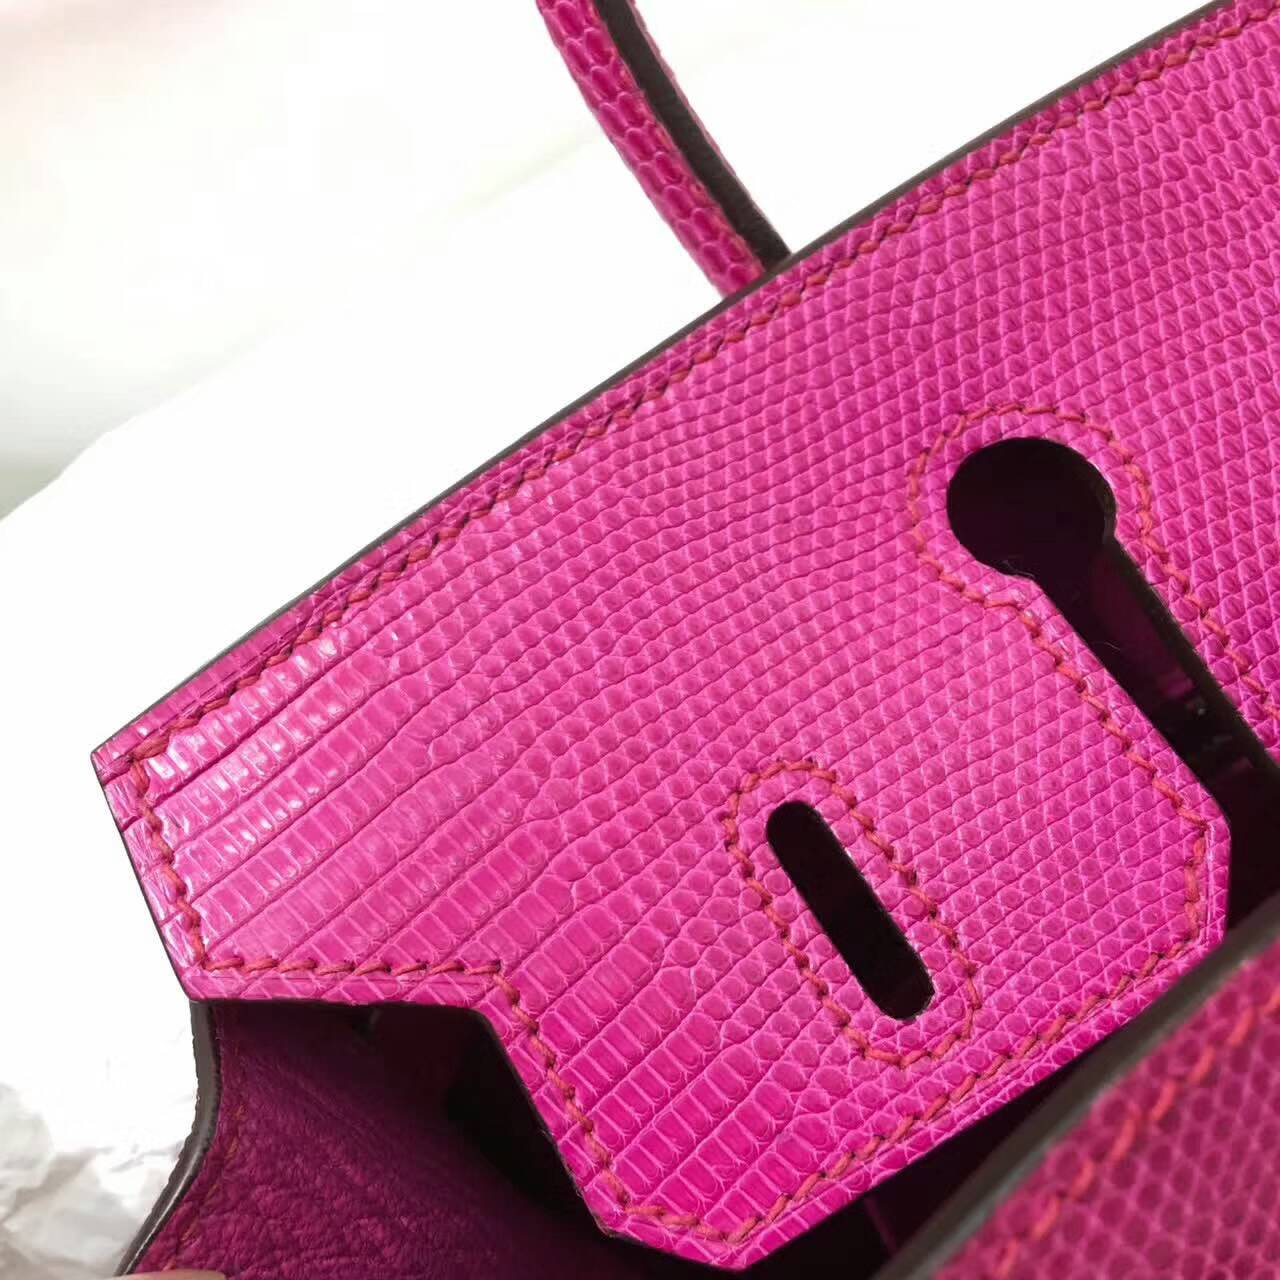 Birkin铂金包 Hermes包包 25cm Lizard 东南亚原产蜥蜴皮 J5 Rose Sheherazade 天荒夜谭紫 金扣